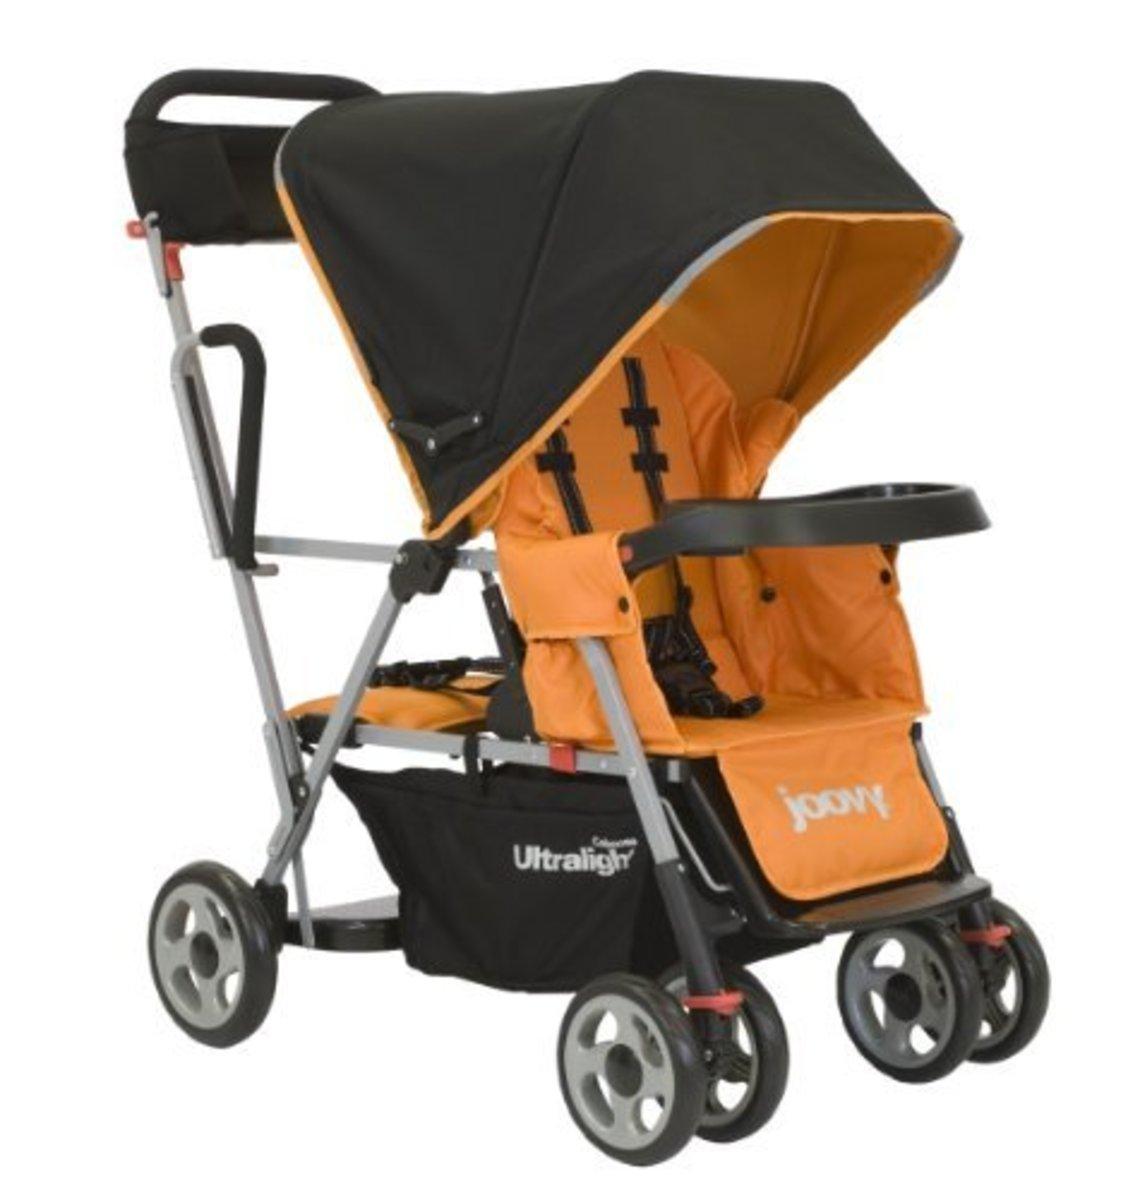 Joovy Caboose Ultralight Stand On Tandem Stroller, Orangie